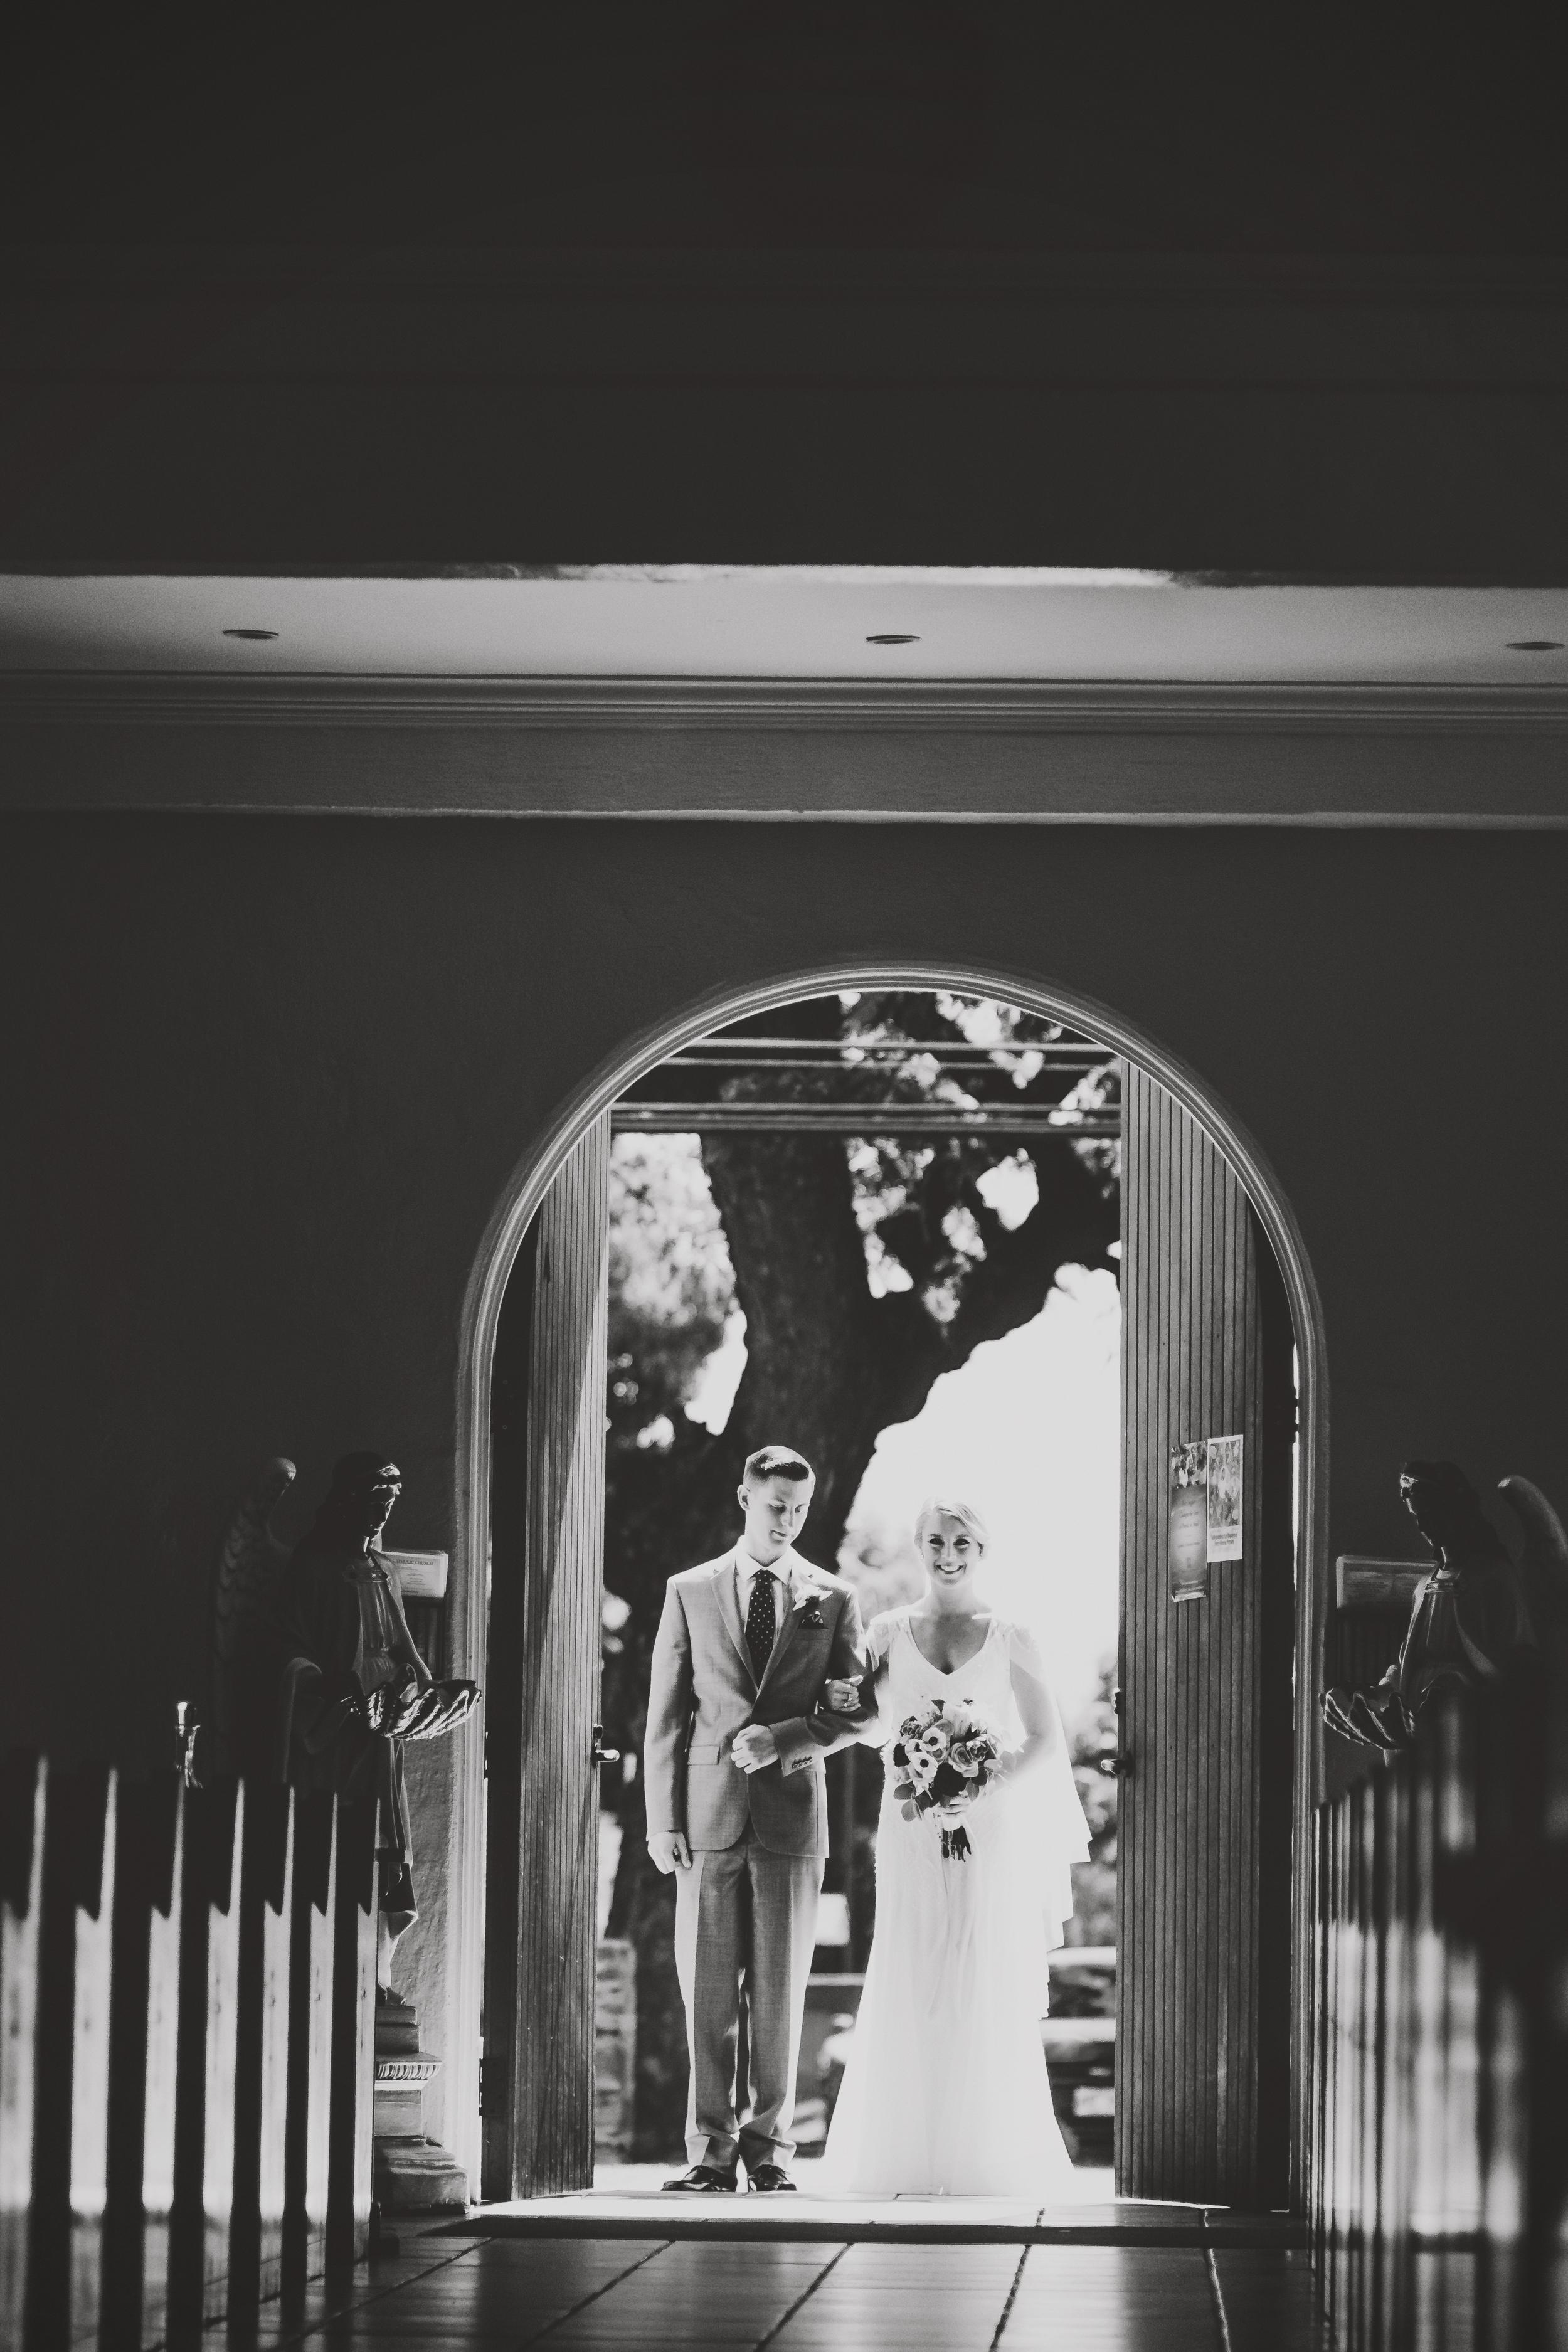 angie-diaz-photography-maui-wedding-mel-matt-25.jpeg